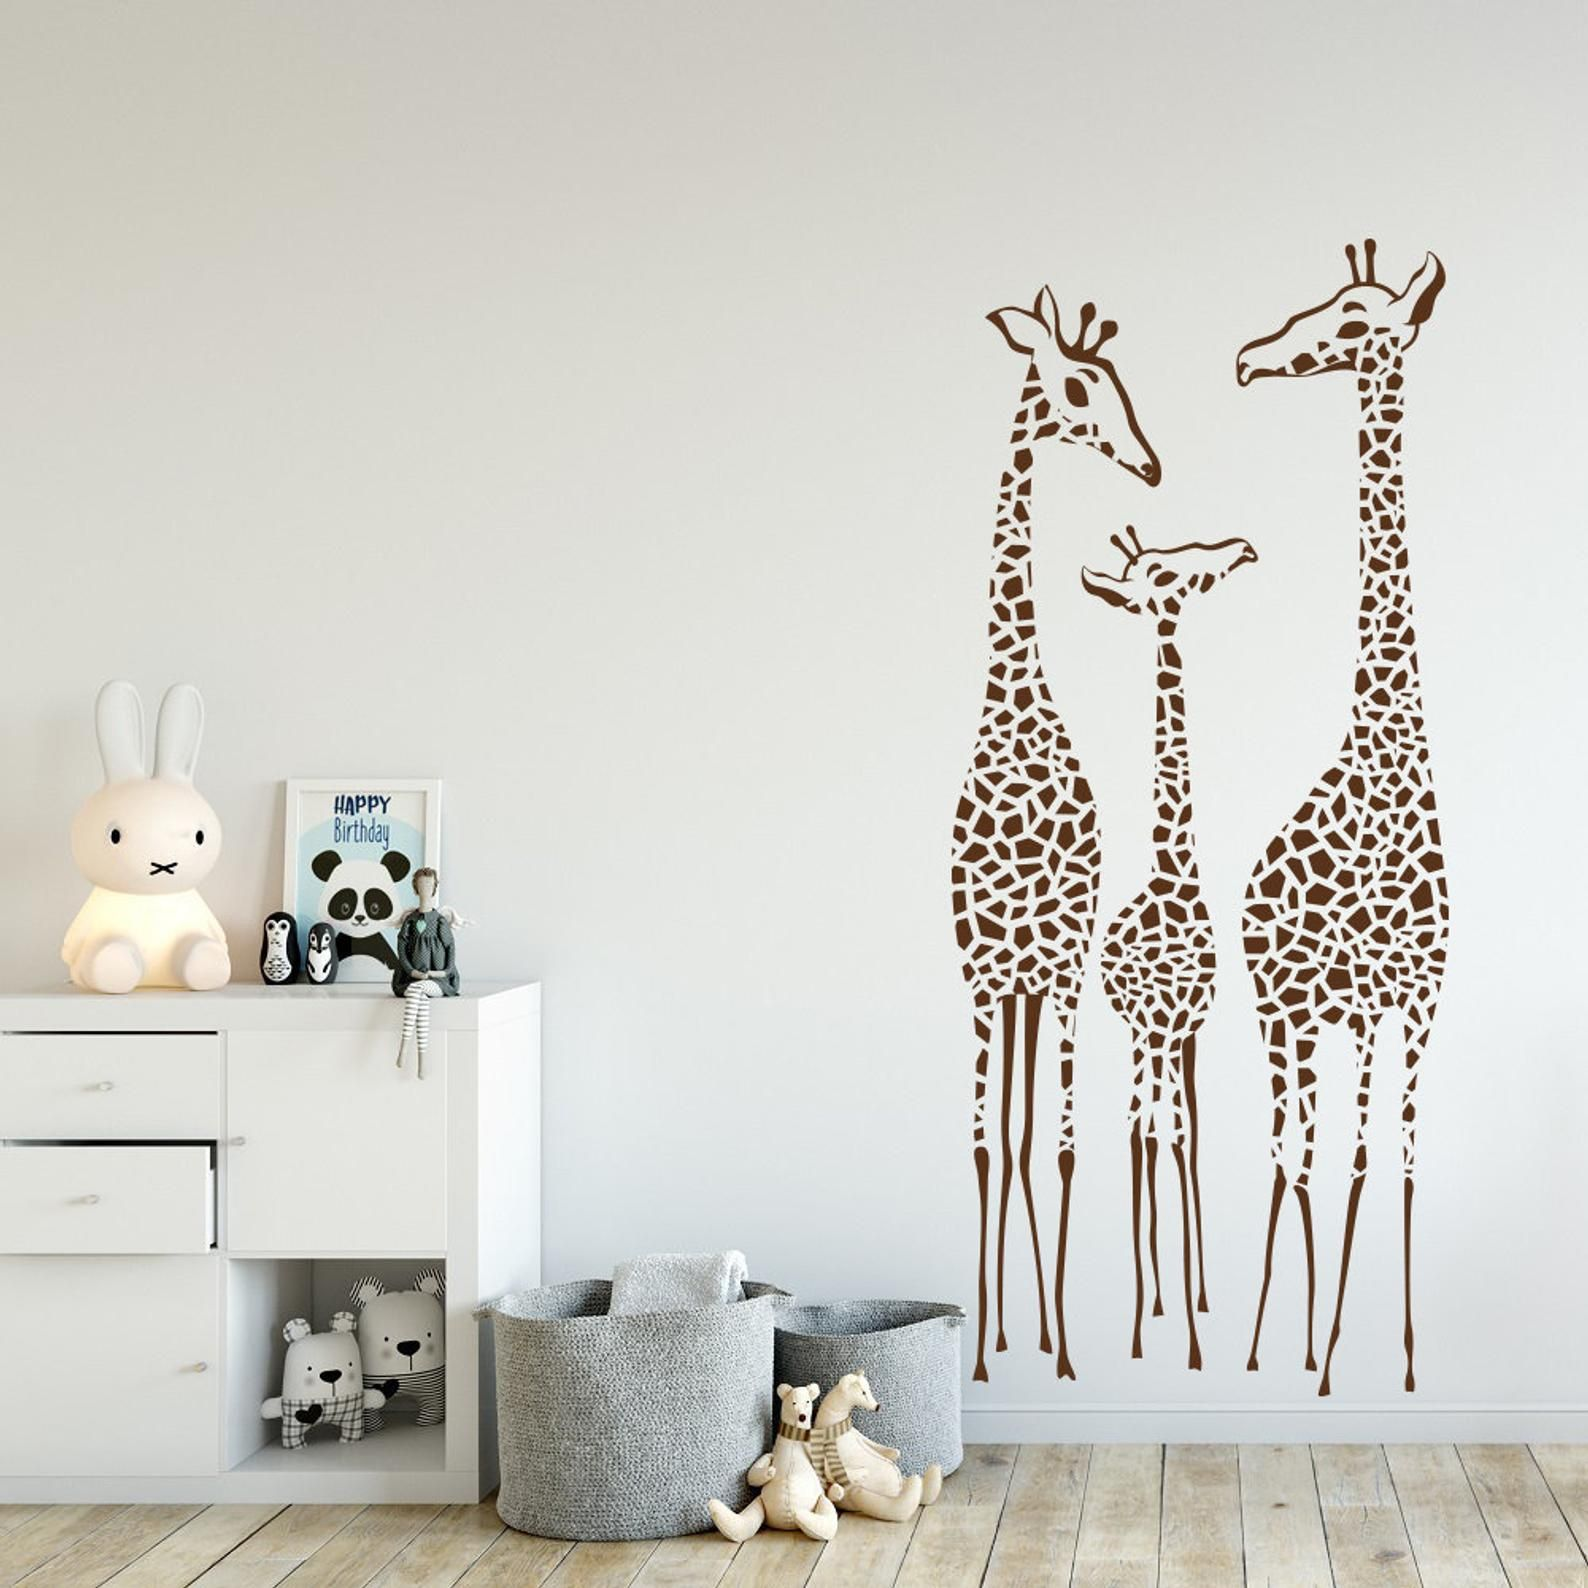 Nursery Giraffe Wall Decal Giraffes Family Wall Decal Etsy Safari Nursery Decals Nursery Decals Family Wall Decals